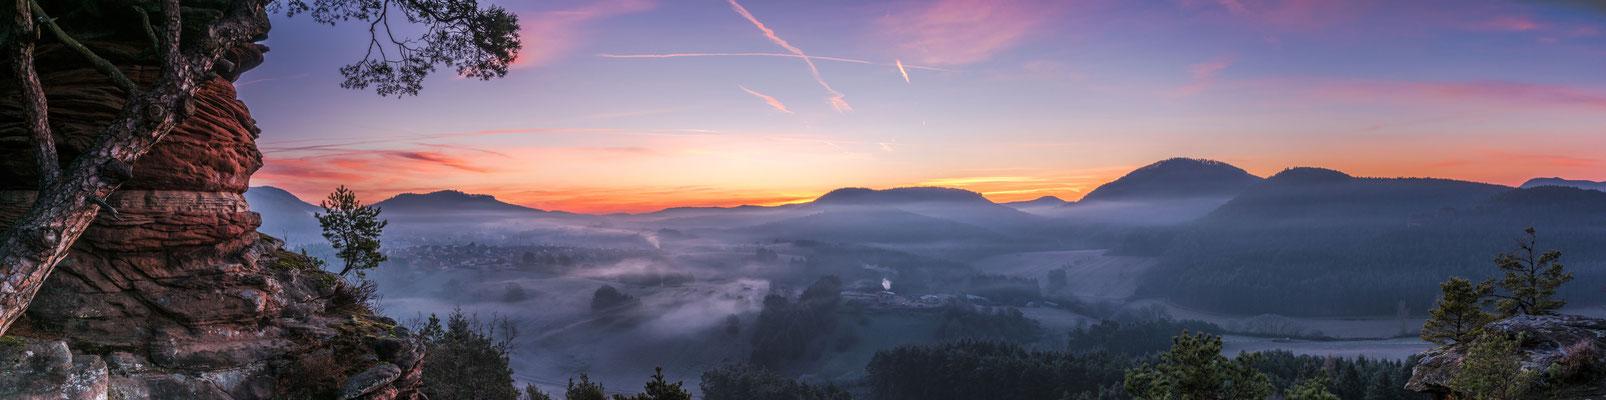 Nebel im Tal - Morgenröte am Himmel